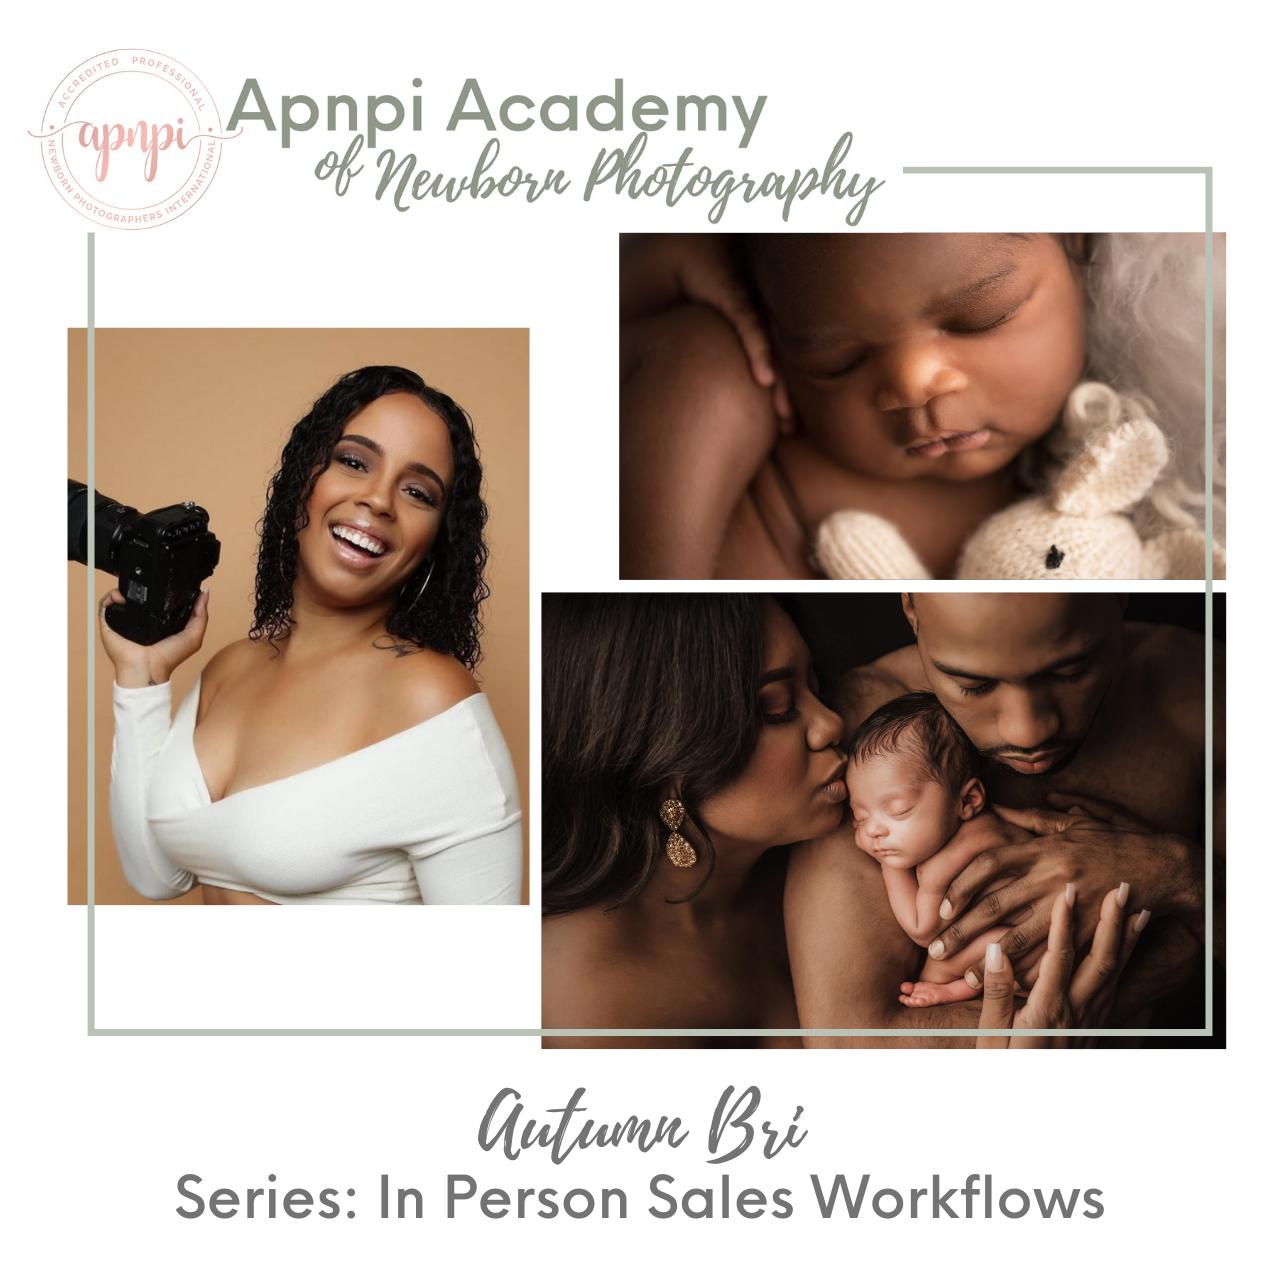 Autumn Bri Newborn In Person Sales IPS APNPI Academy Course